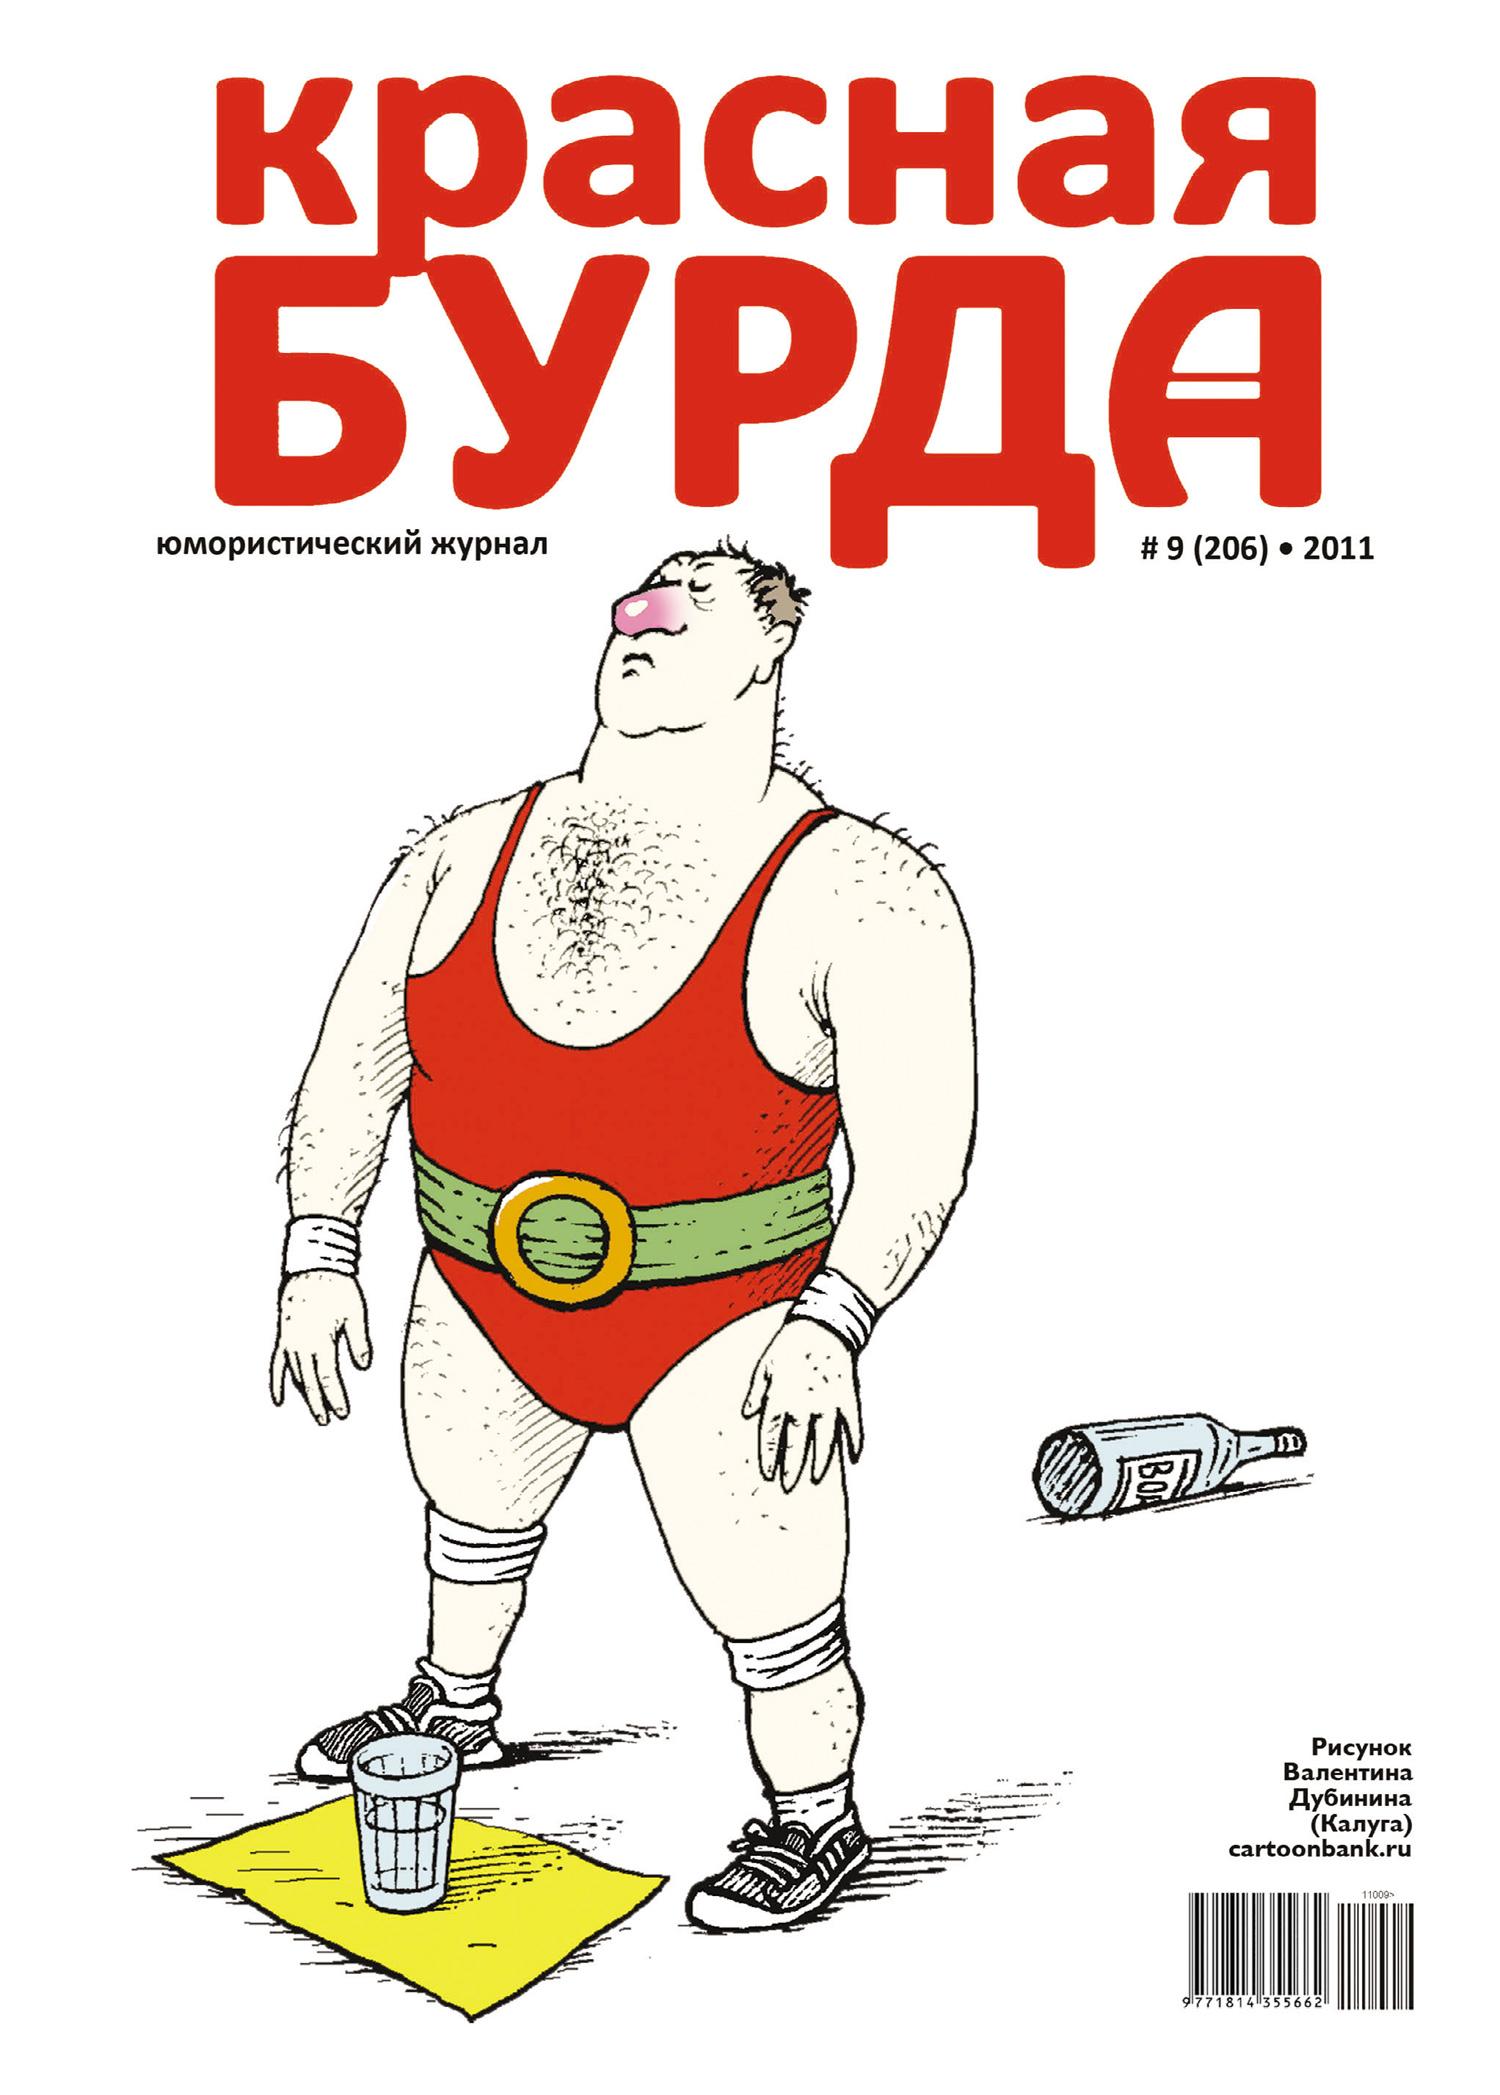 Красная бурда. Юмористический журнал №9 (206) 2011